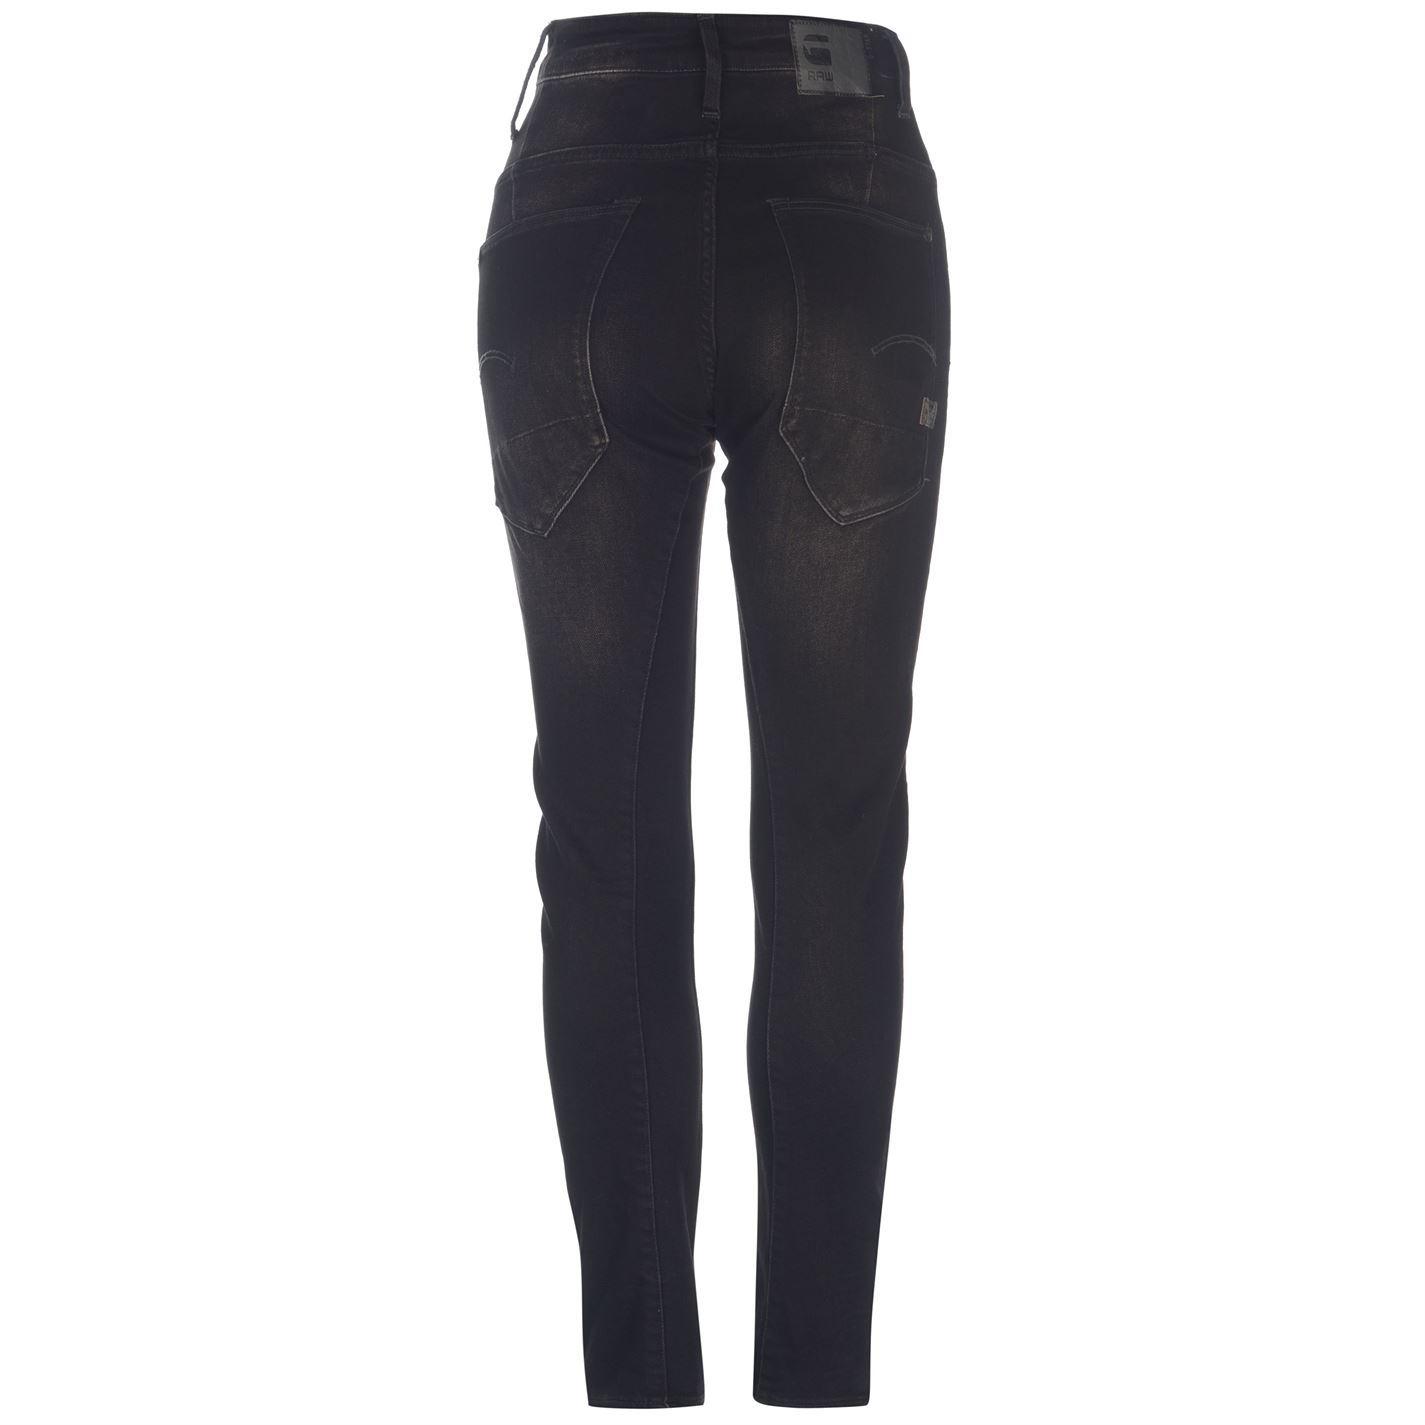 d00b2360ab Jeans Denim G Star C 3D Super Slim Mens Trouser Pants Dark Aged | eBay